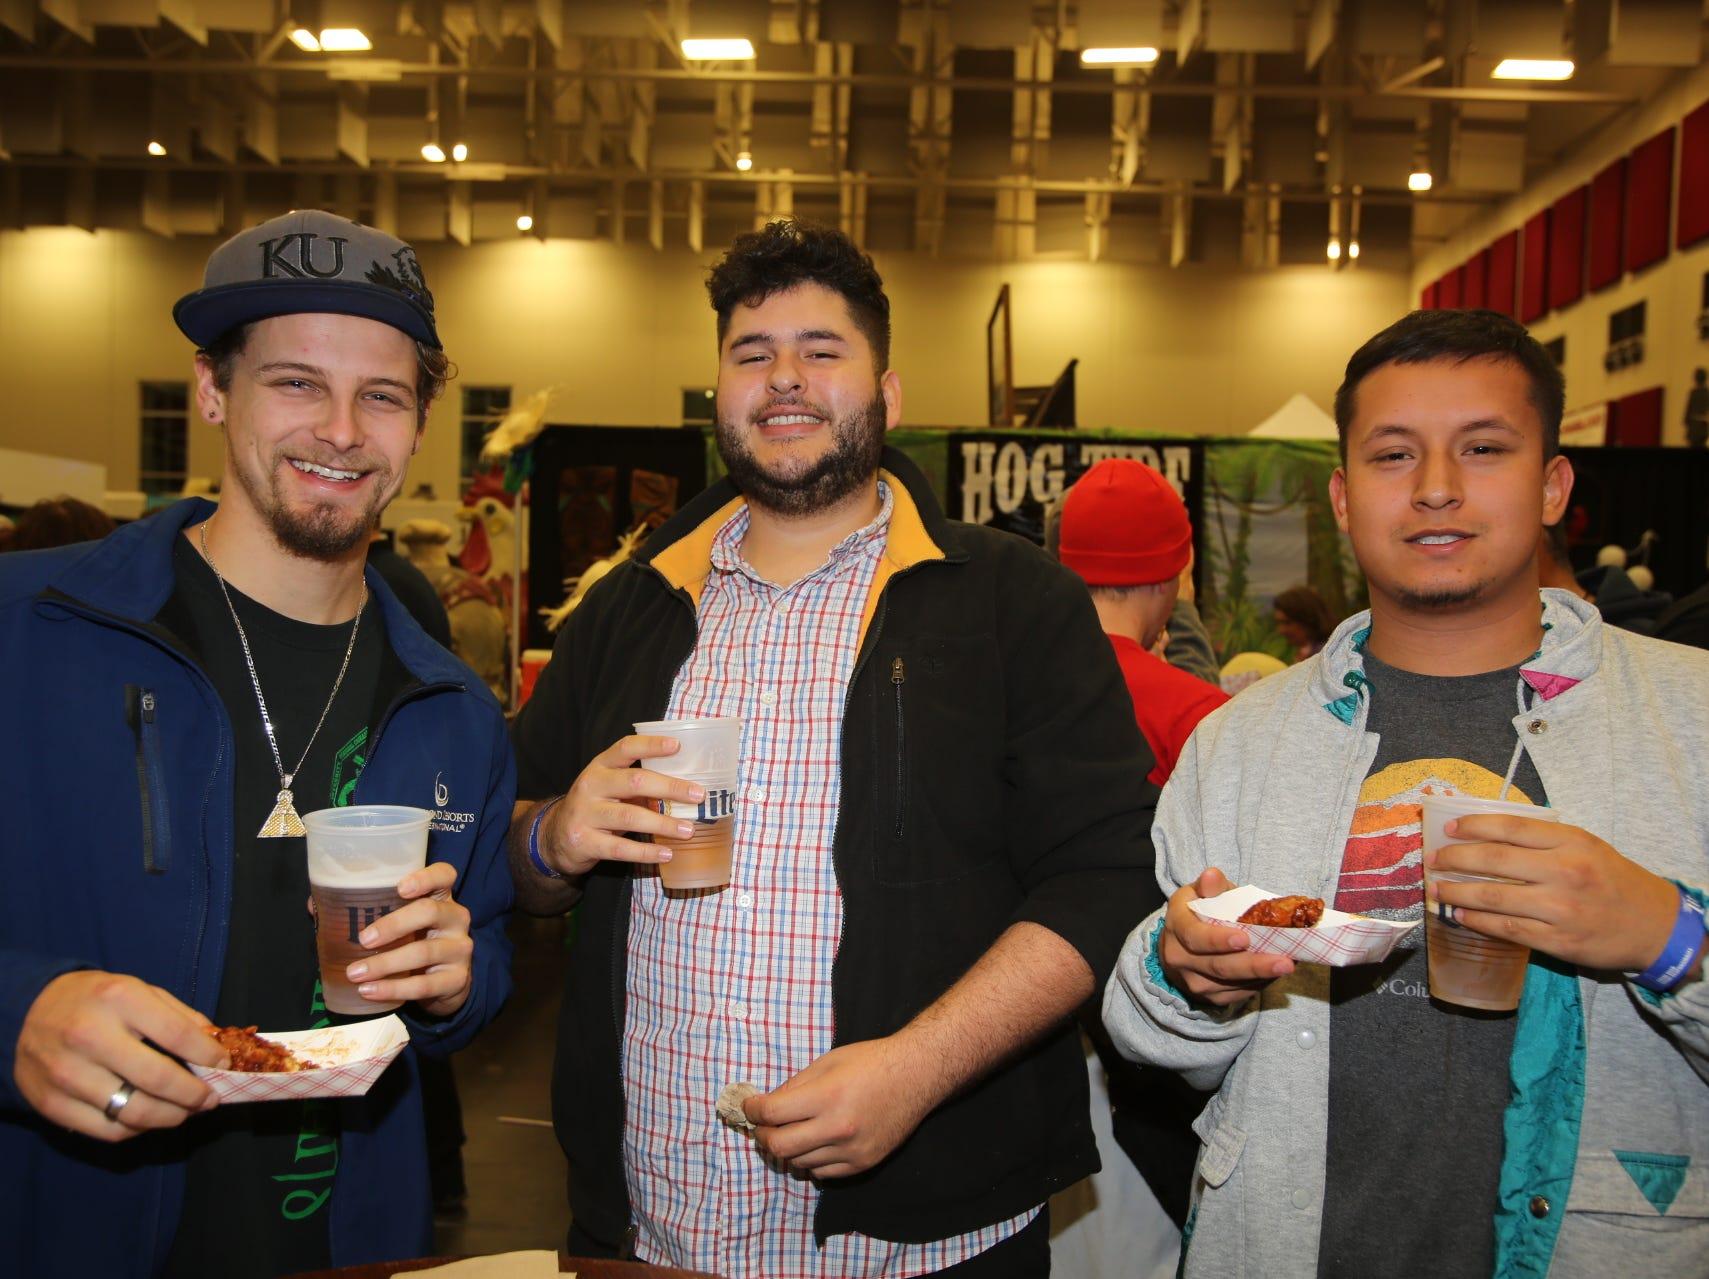 Dillon Mooney, Eli Serratos, and Bryan Hernanadez